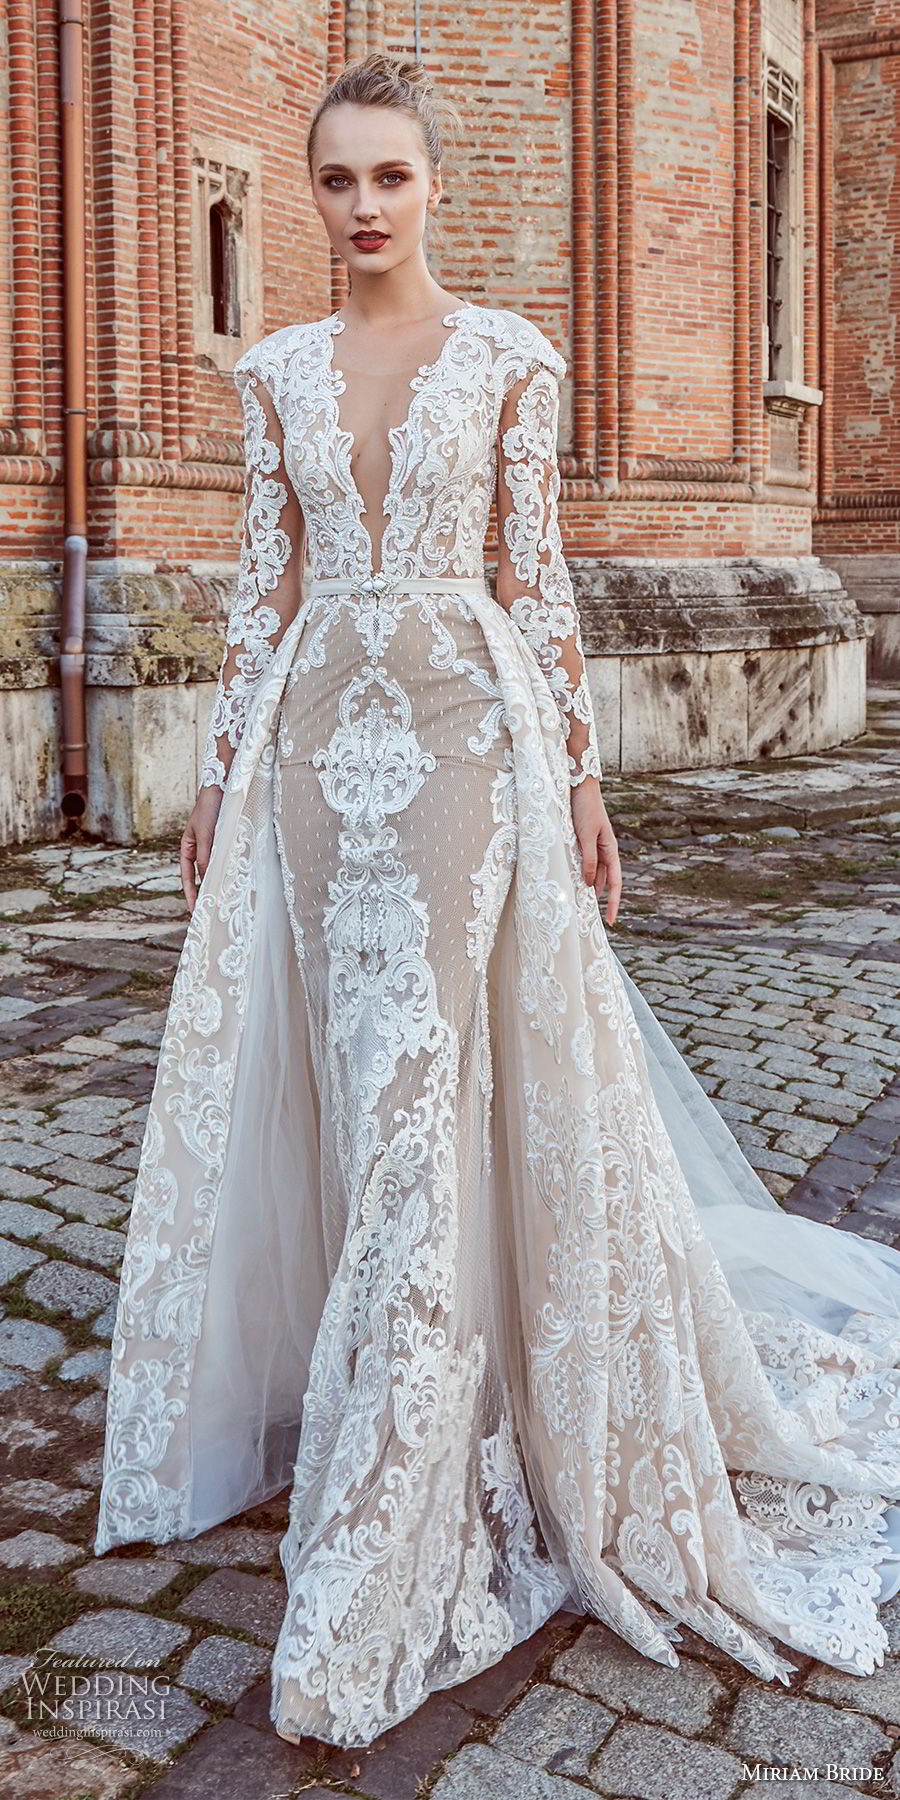 miriams bride 2018 bridal long sleeves deep v neck full embellishment glamorous elegant fit and flare wedding dress a line overskirt sheer button back royal train (4) mv